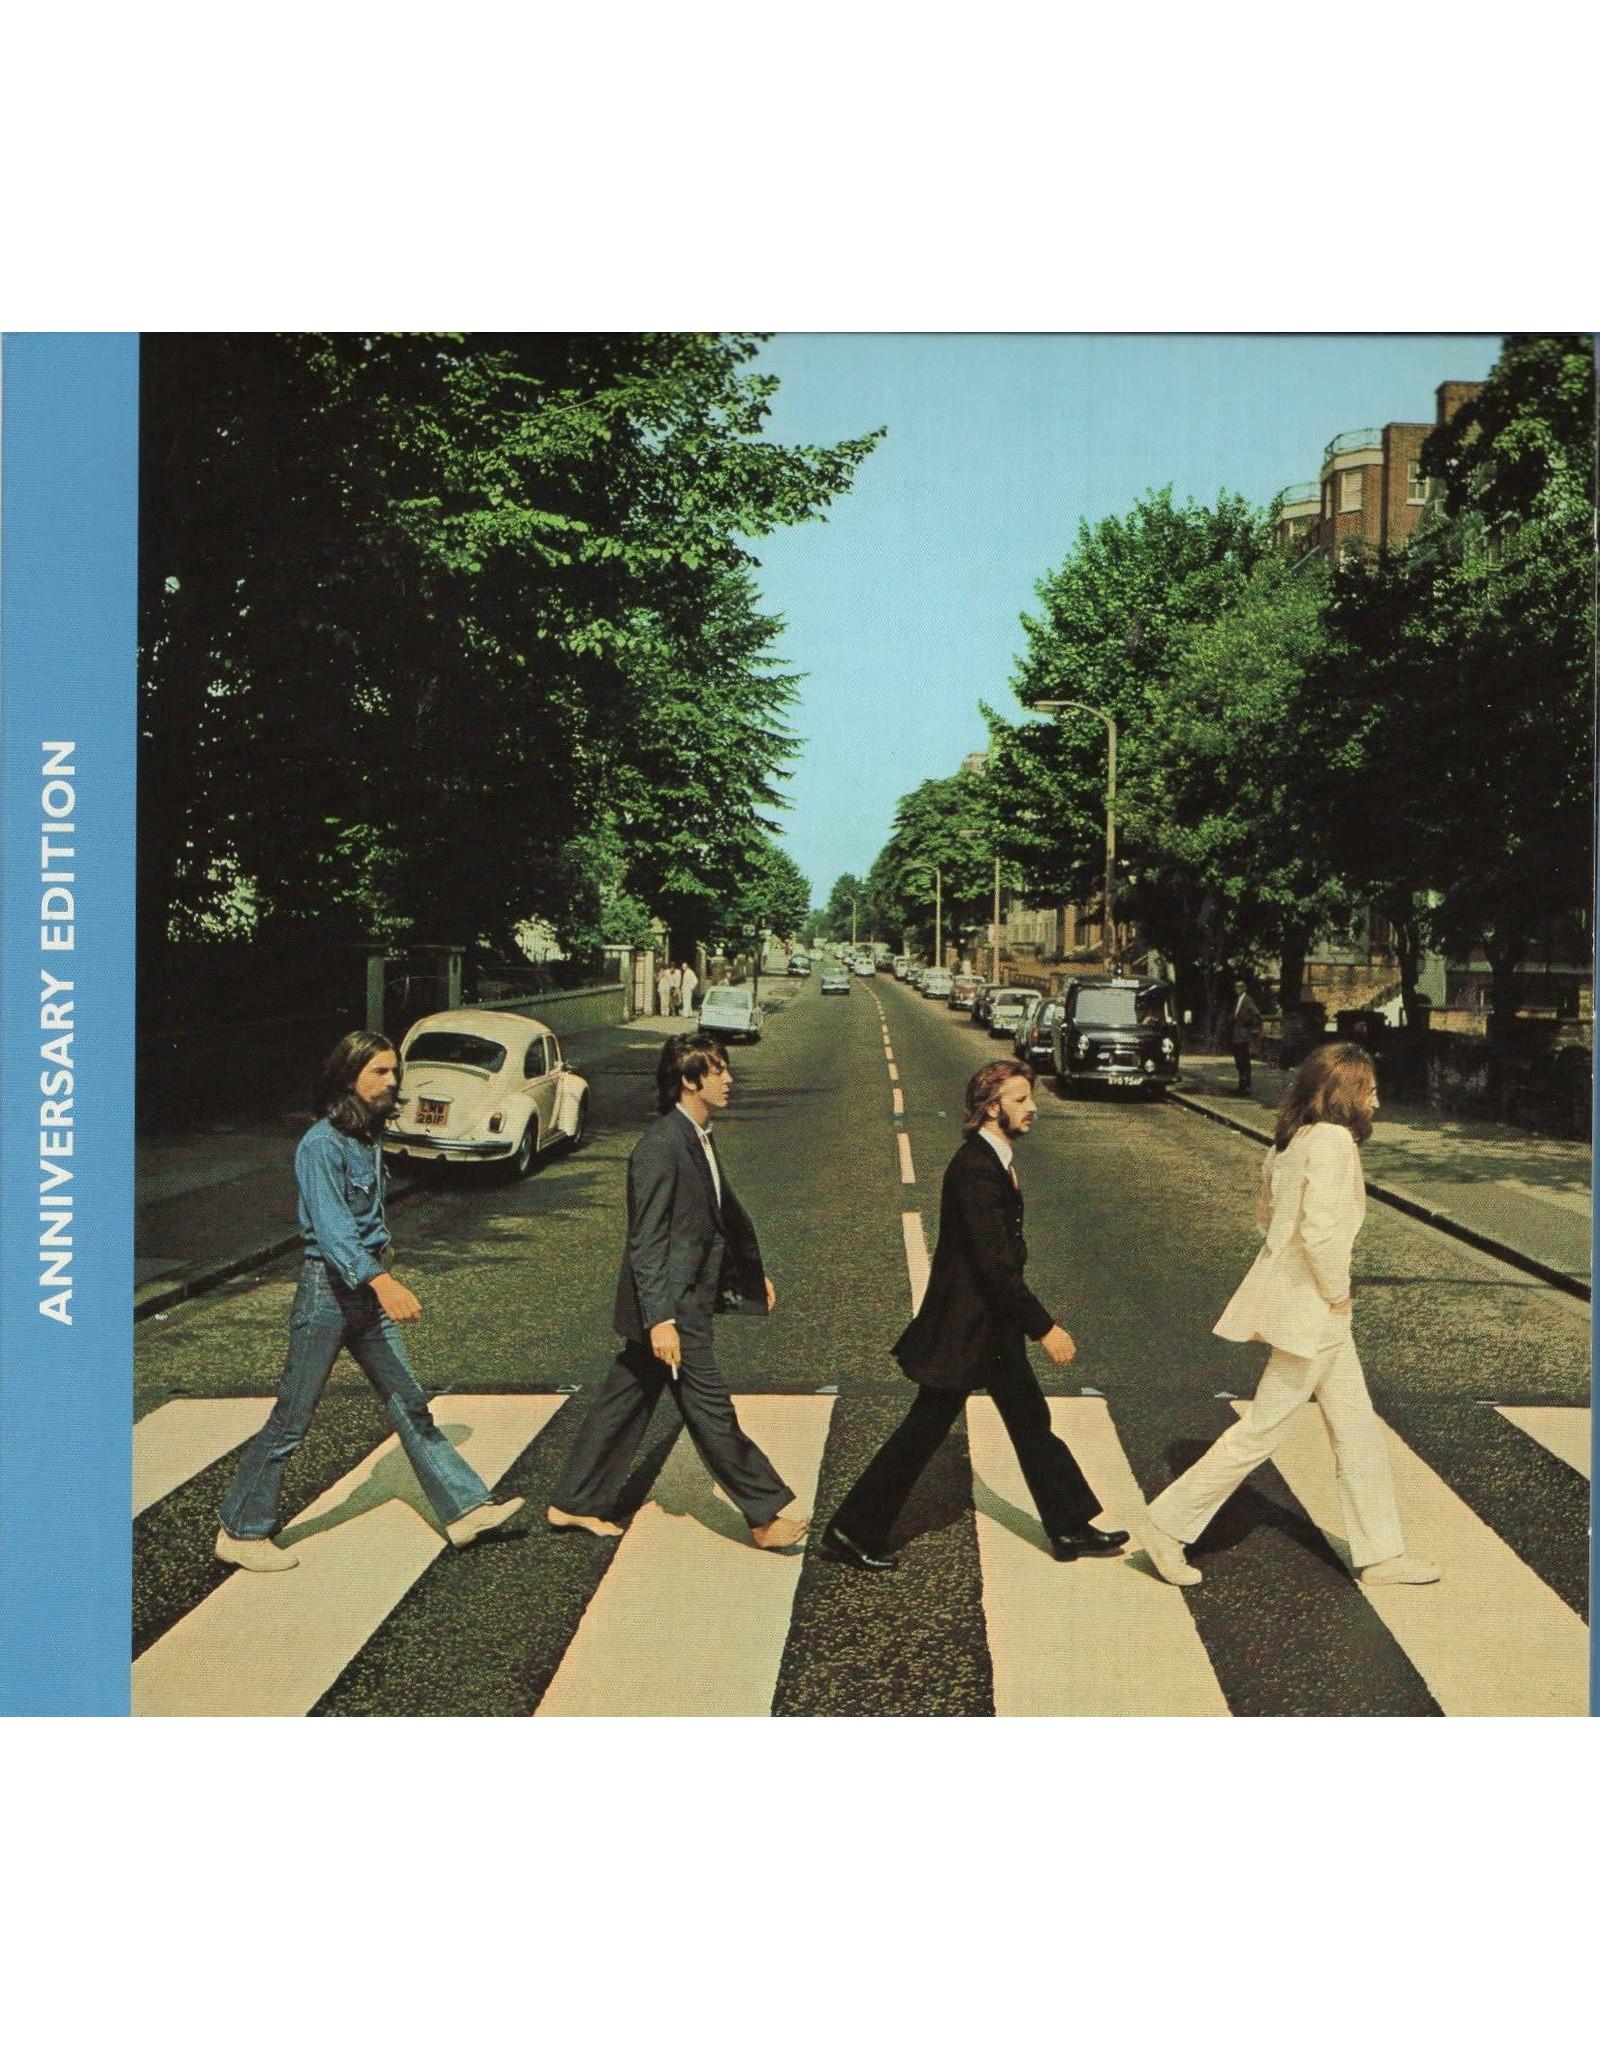 Beatles - Abbey Road (50th Anniversary) CD